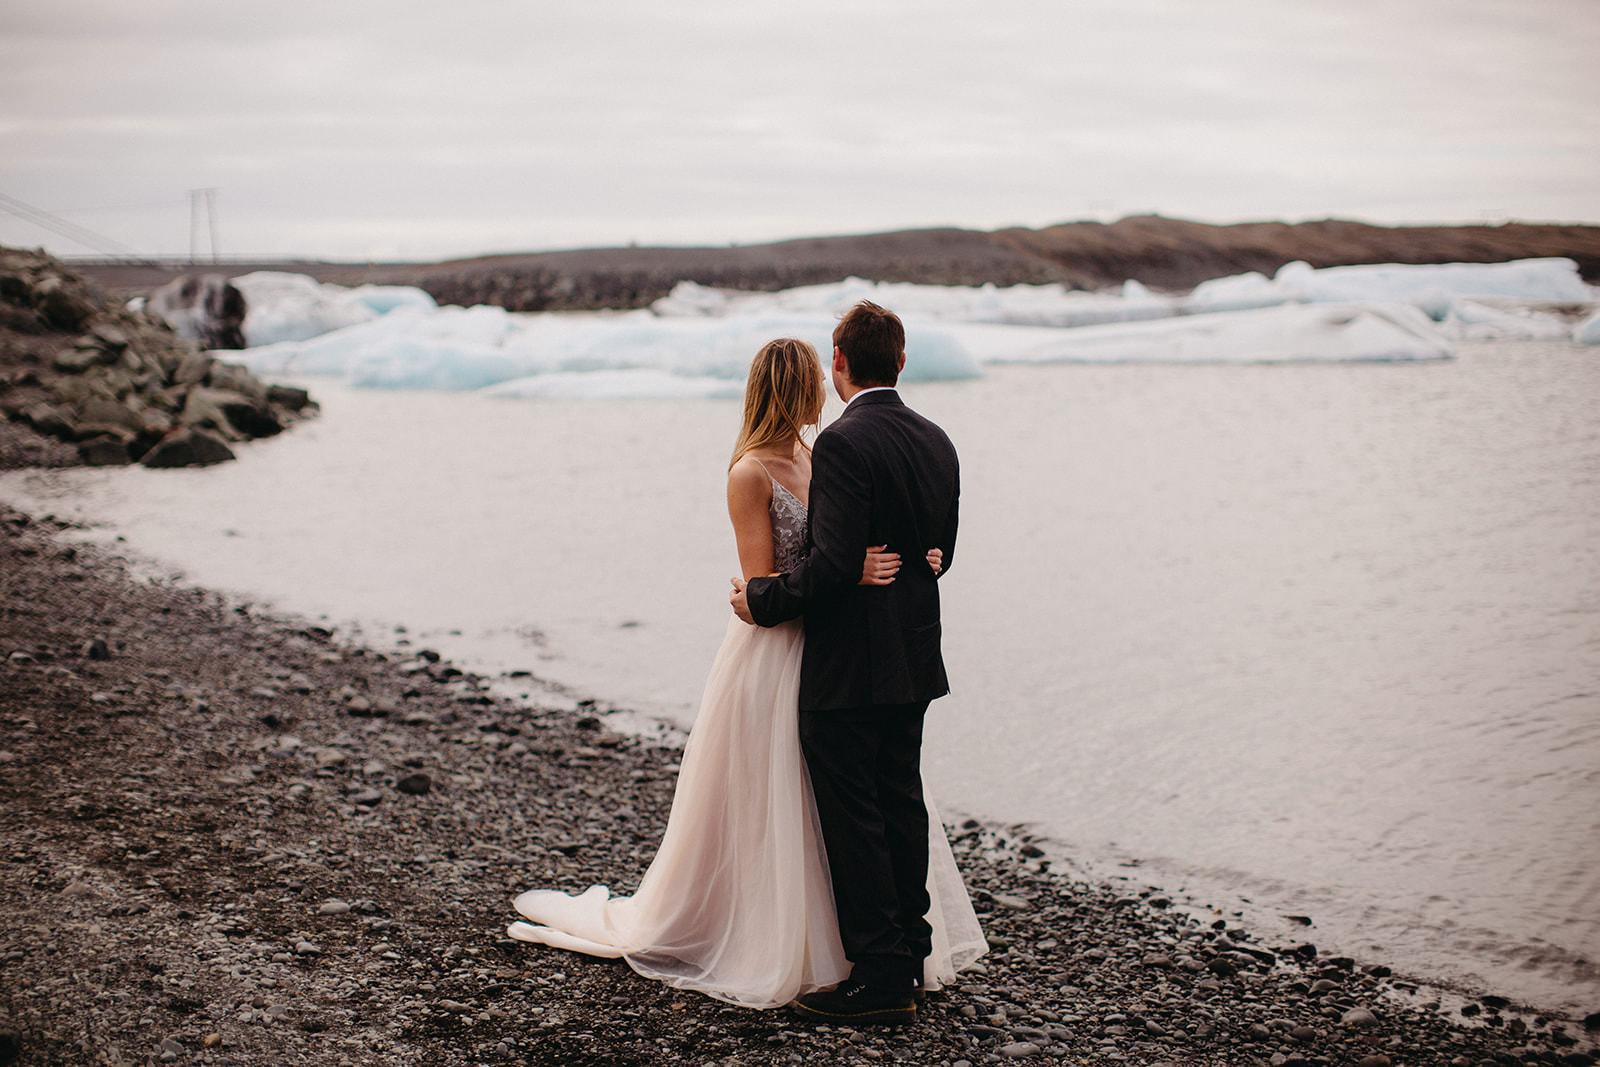 Icelandic Iceland Elopement Wedding Elope Photographer Eloping Reykjavík Vik Black Sand Beach Jökulsárlón Skogafoss Waterfall Vestrahorn Mountain Liz Osban Photography Destination 50.jpg